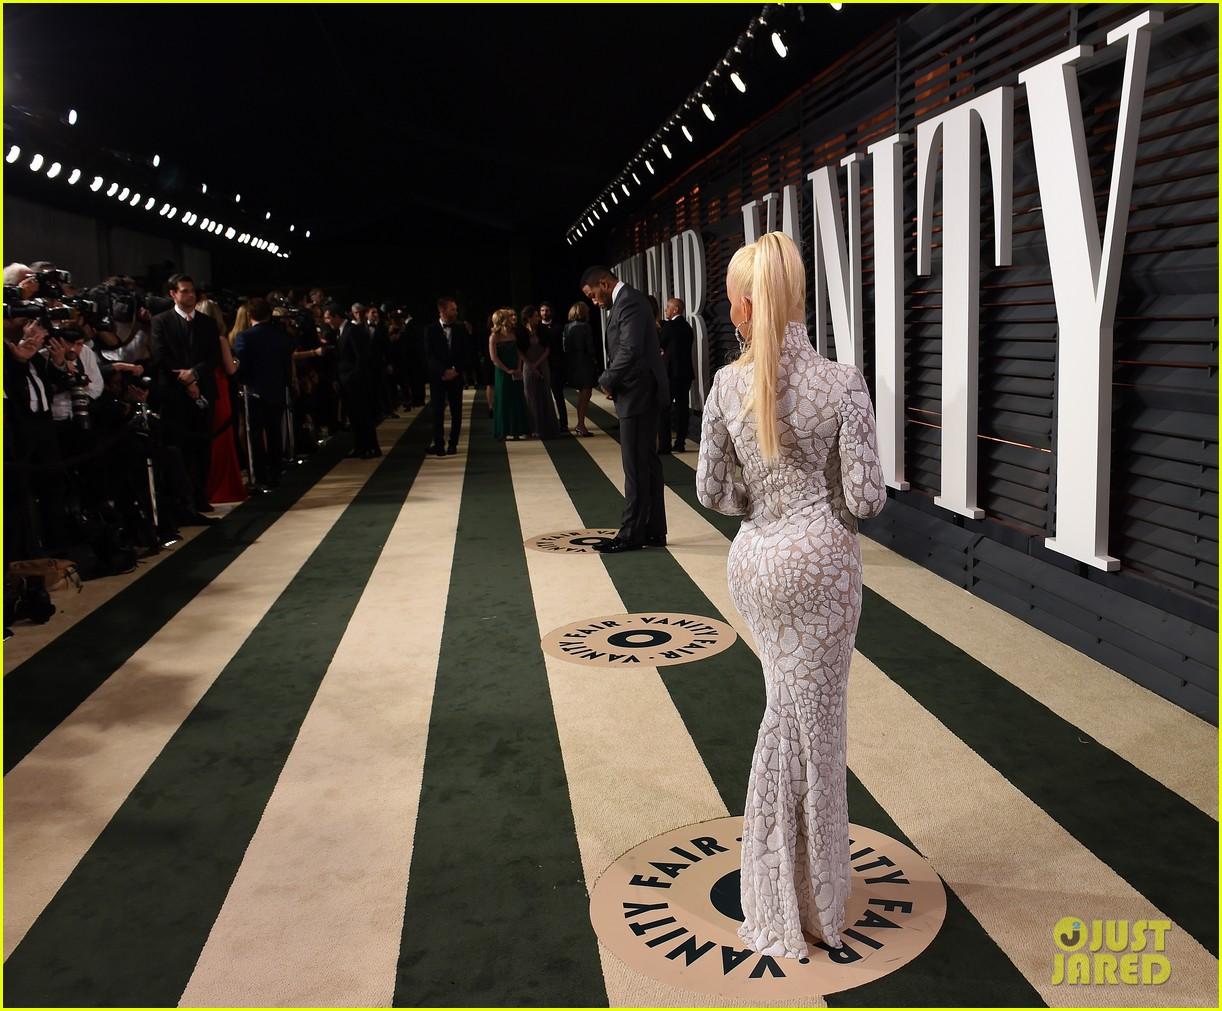 Tema Oficial: Christina Cantando en la Vanity Fair Party de los Oscars Christina-aguilera-vanity-fair-oscars-2015-party-01